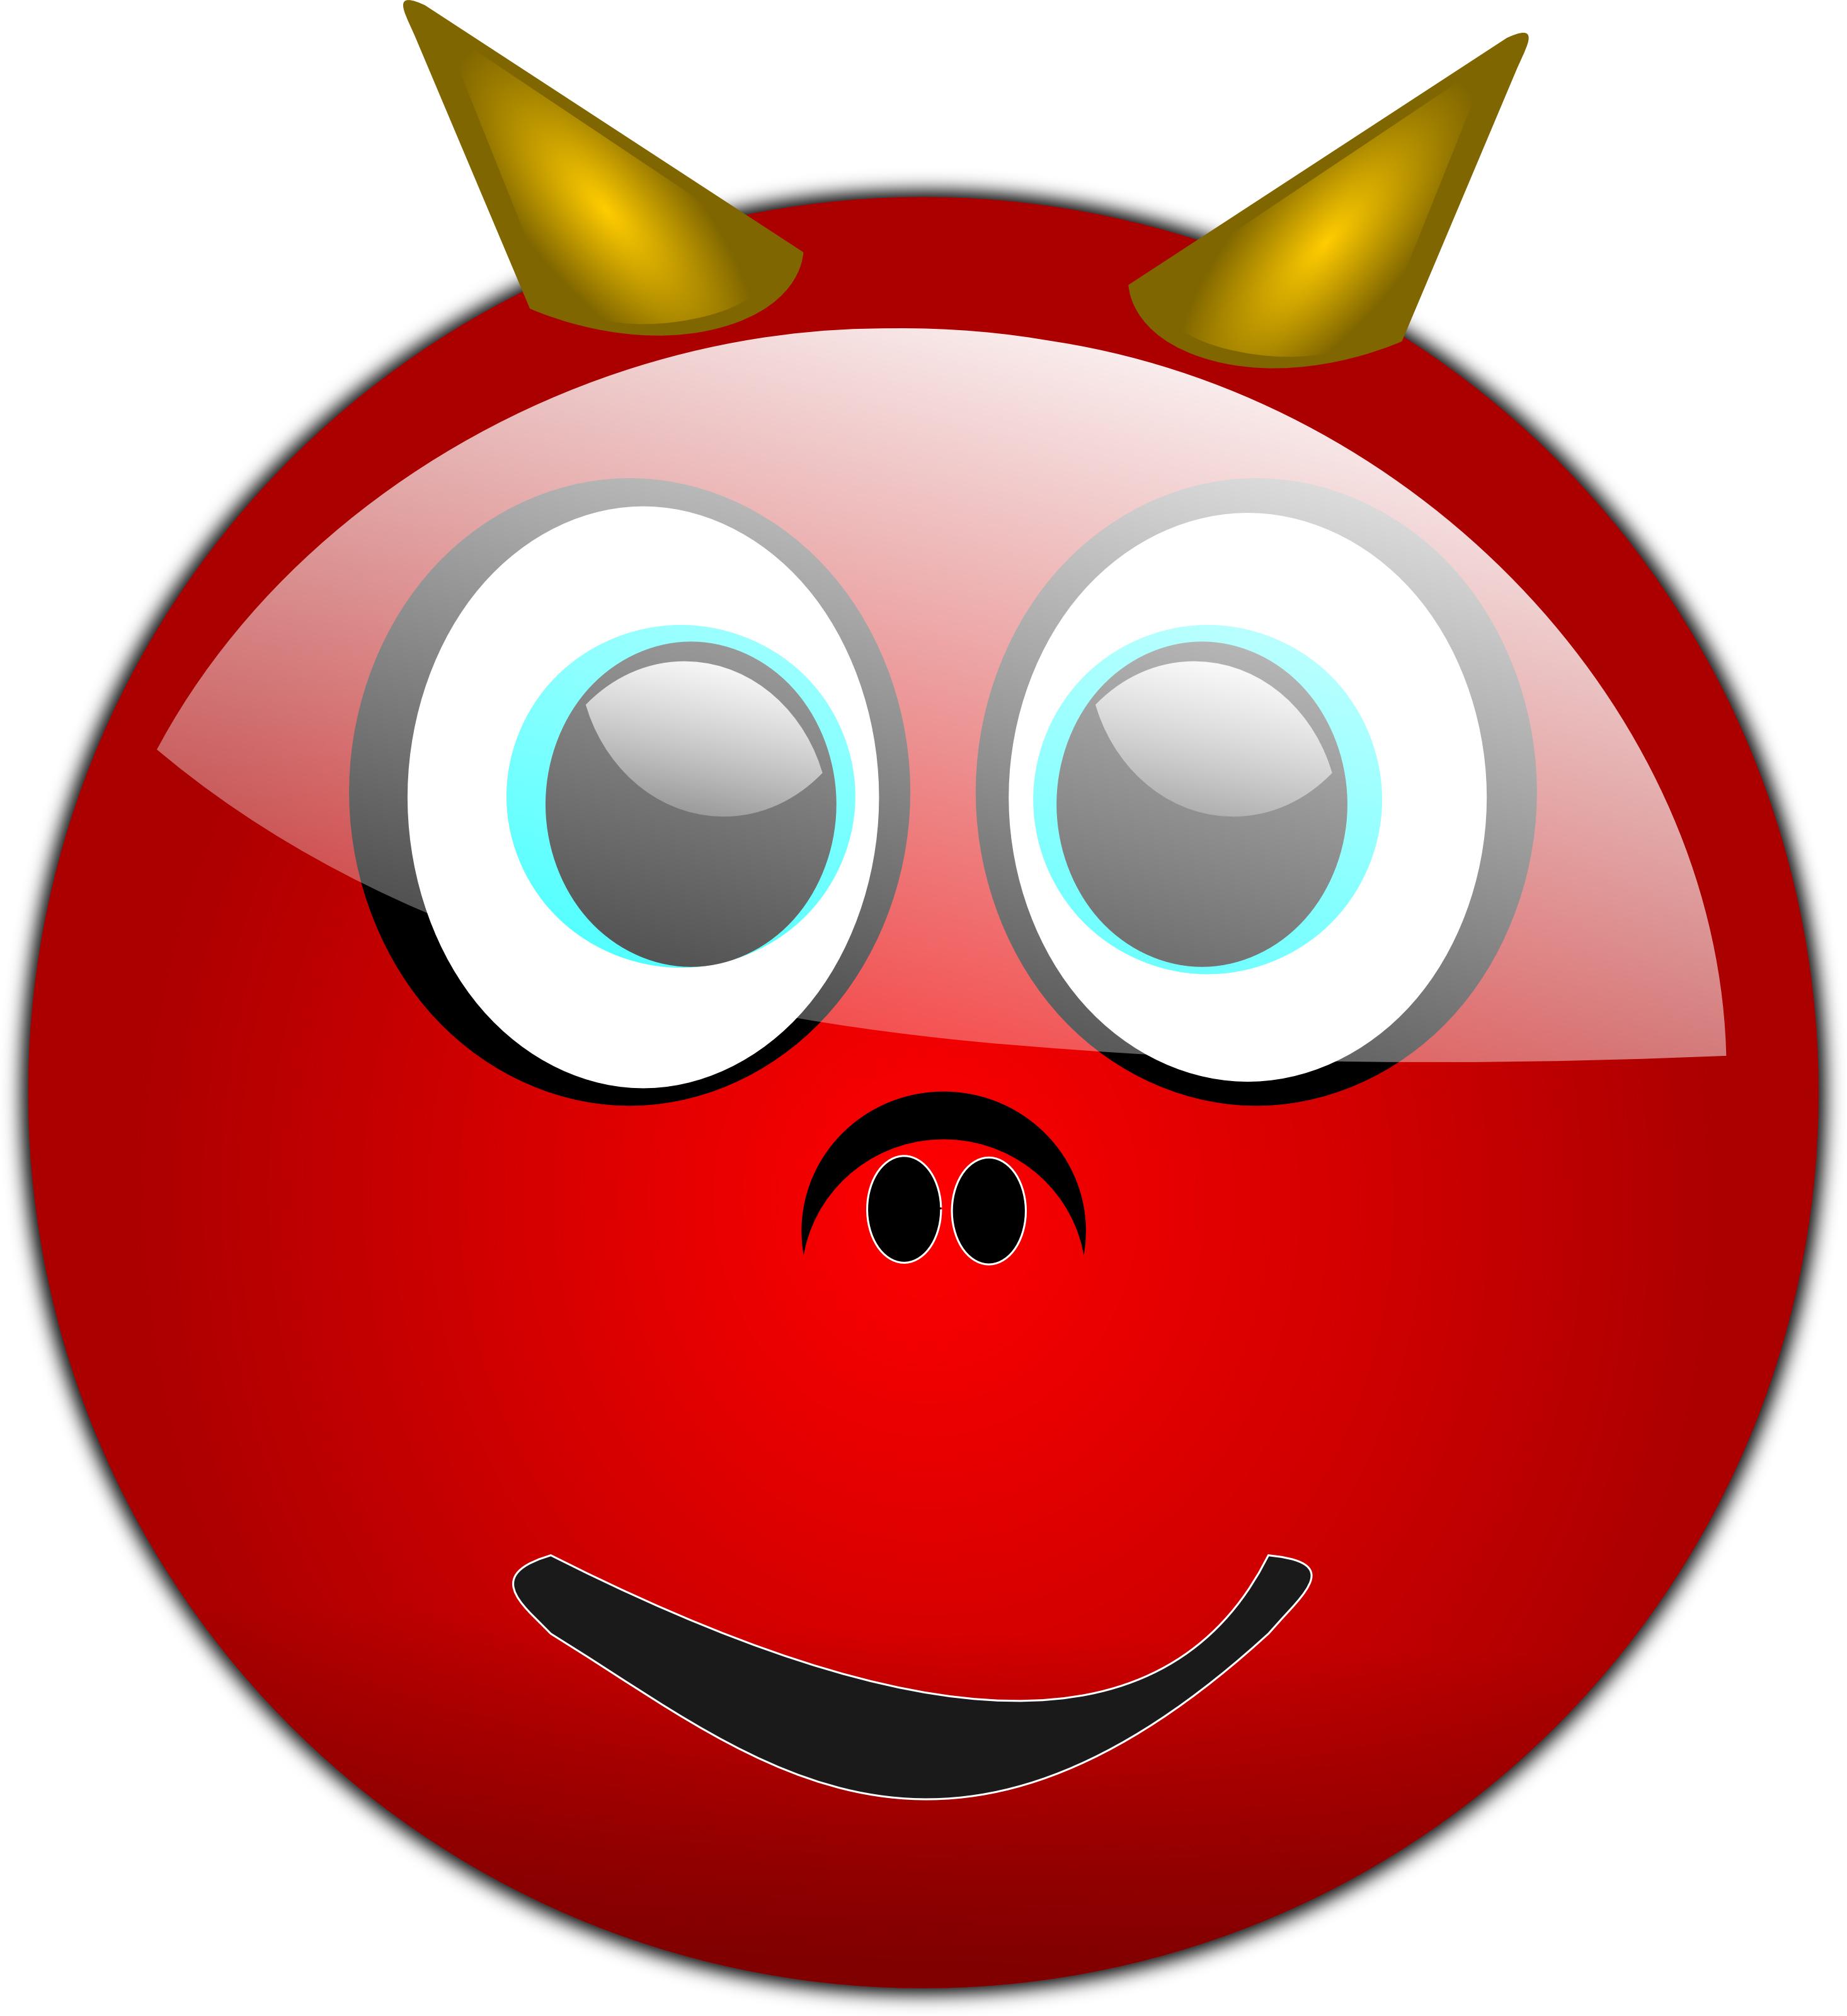 Devil Emoticon - Free Halloween Vector Clipart Illustration by 0001109